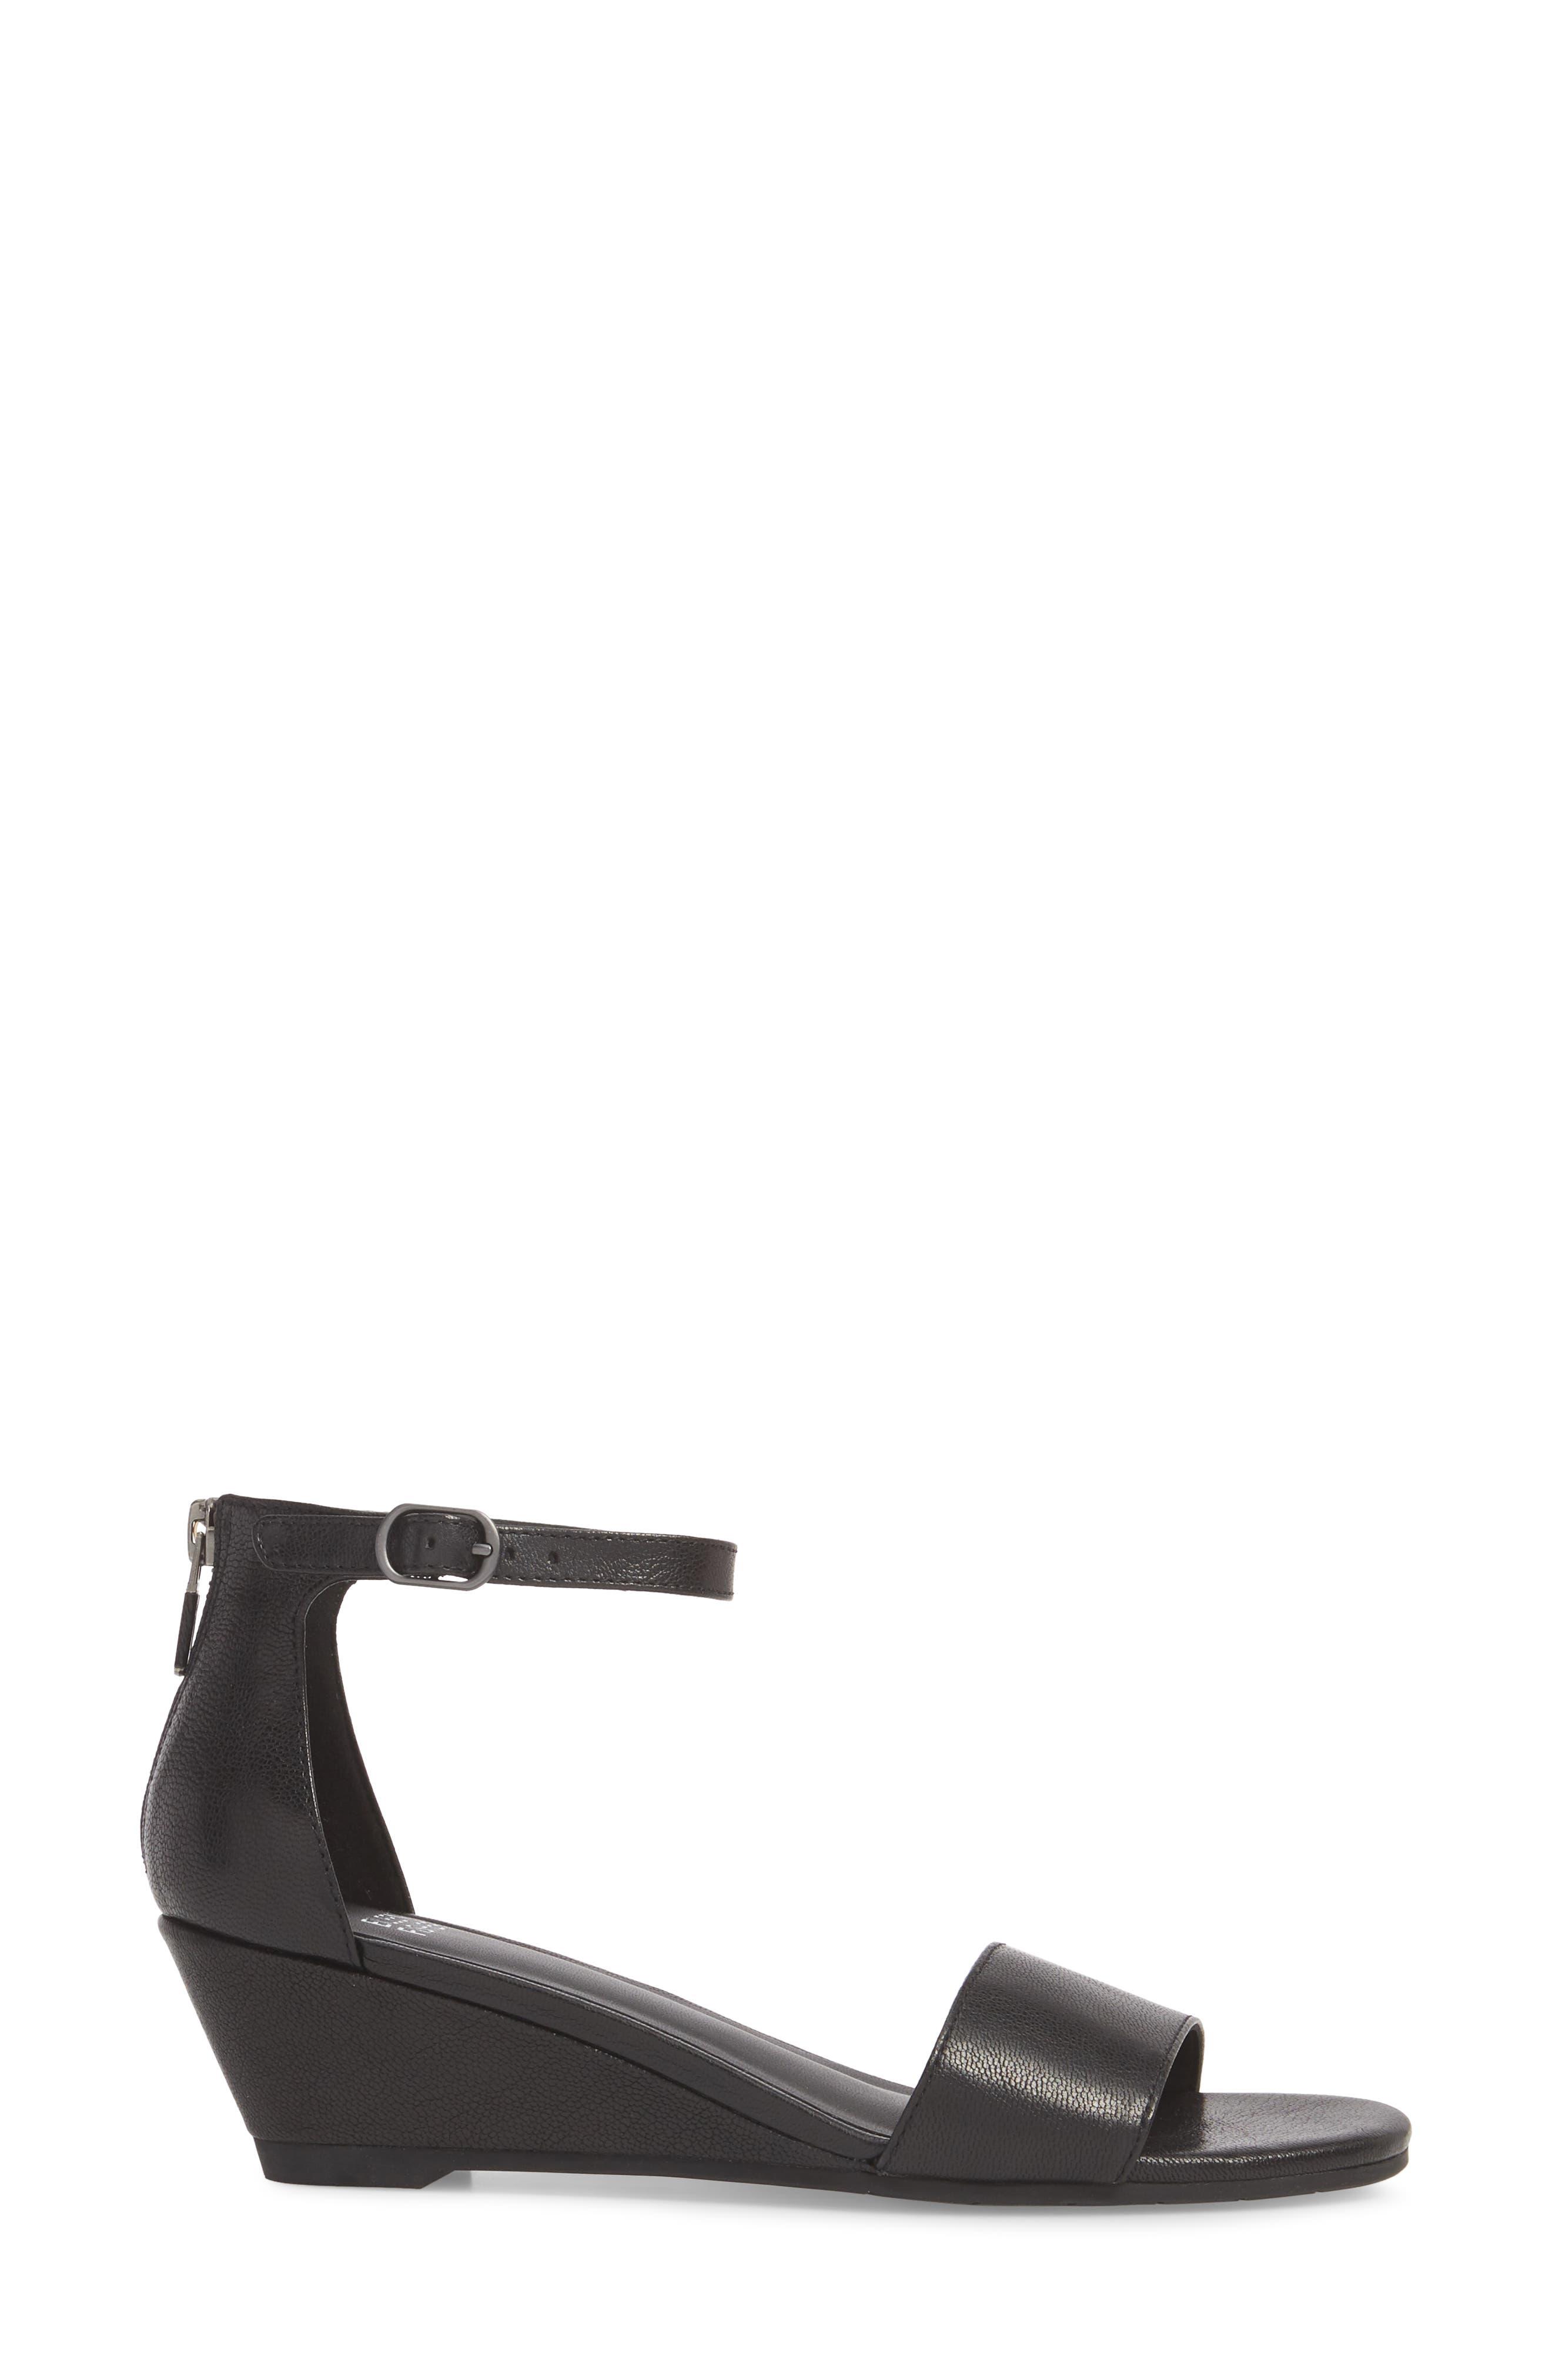 Mara Ankle Strap Wedge Sandal,                             Alternate thumbnail 3, color,                             001